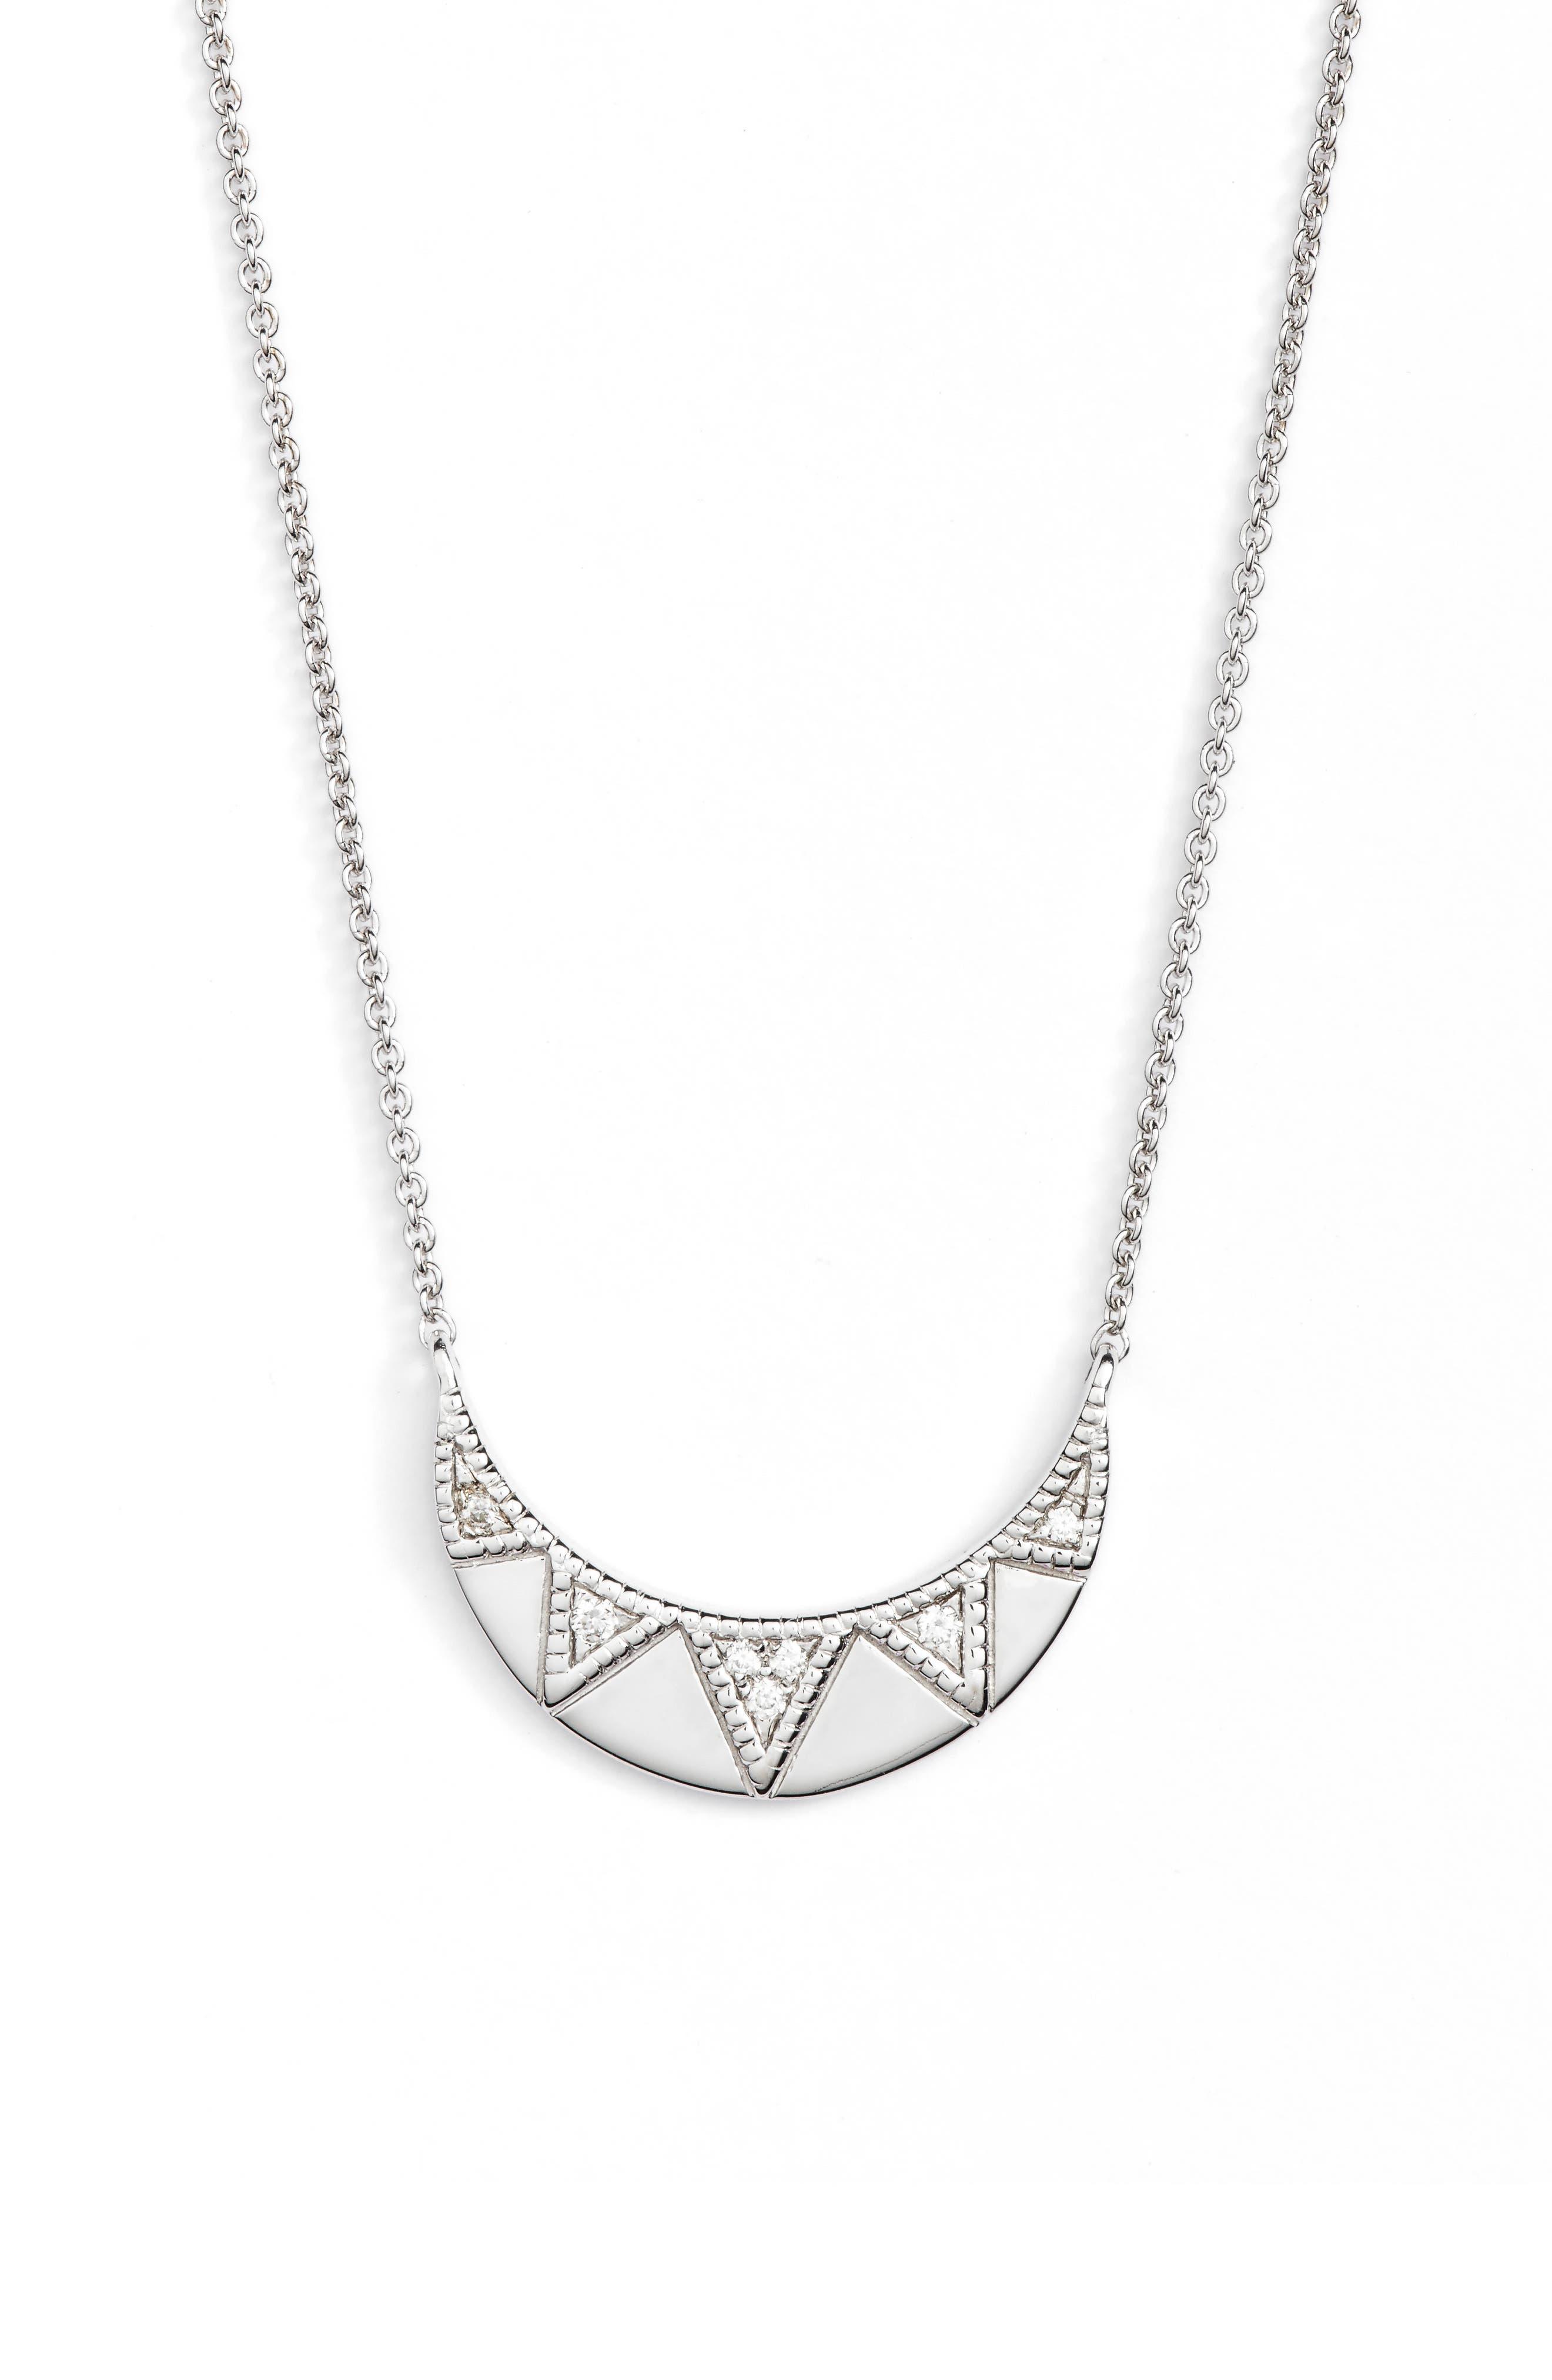 Jeanie Ann Diamond Pendant Necklace,                             Main thumbnail 1, color,                             White Gold